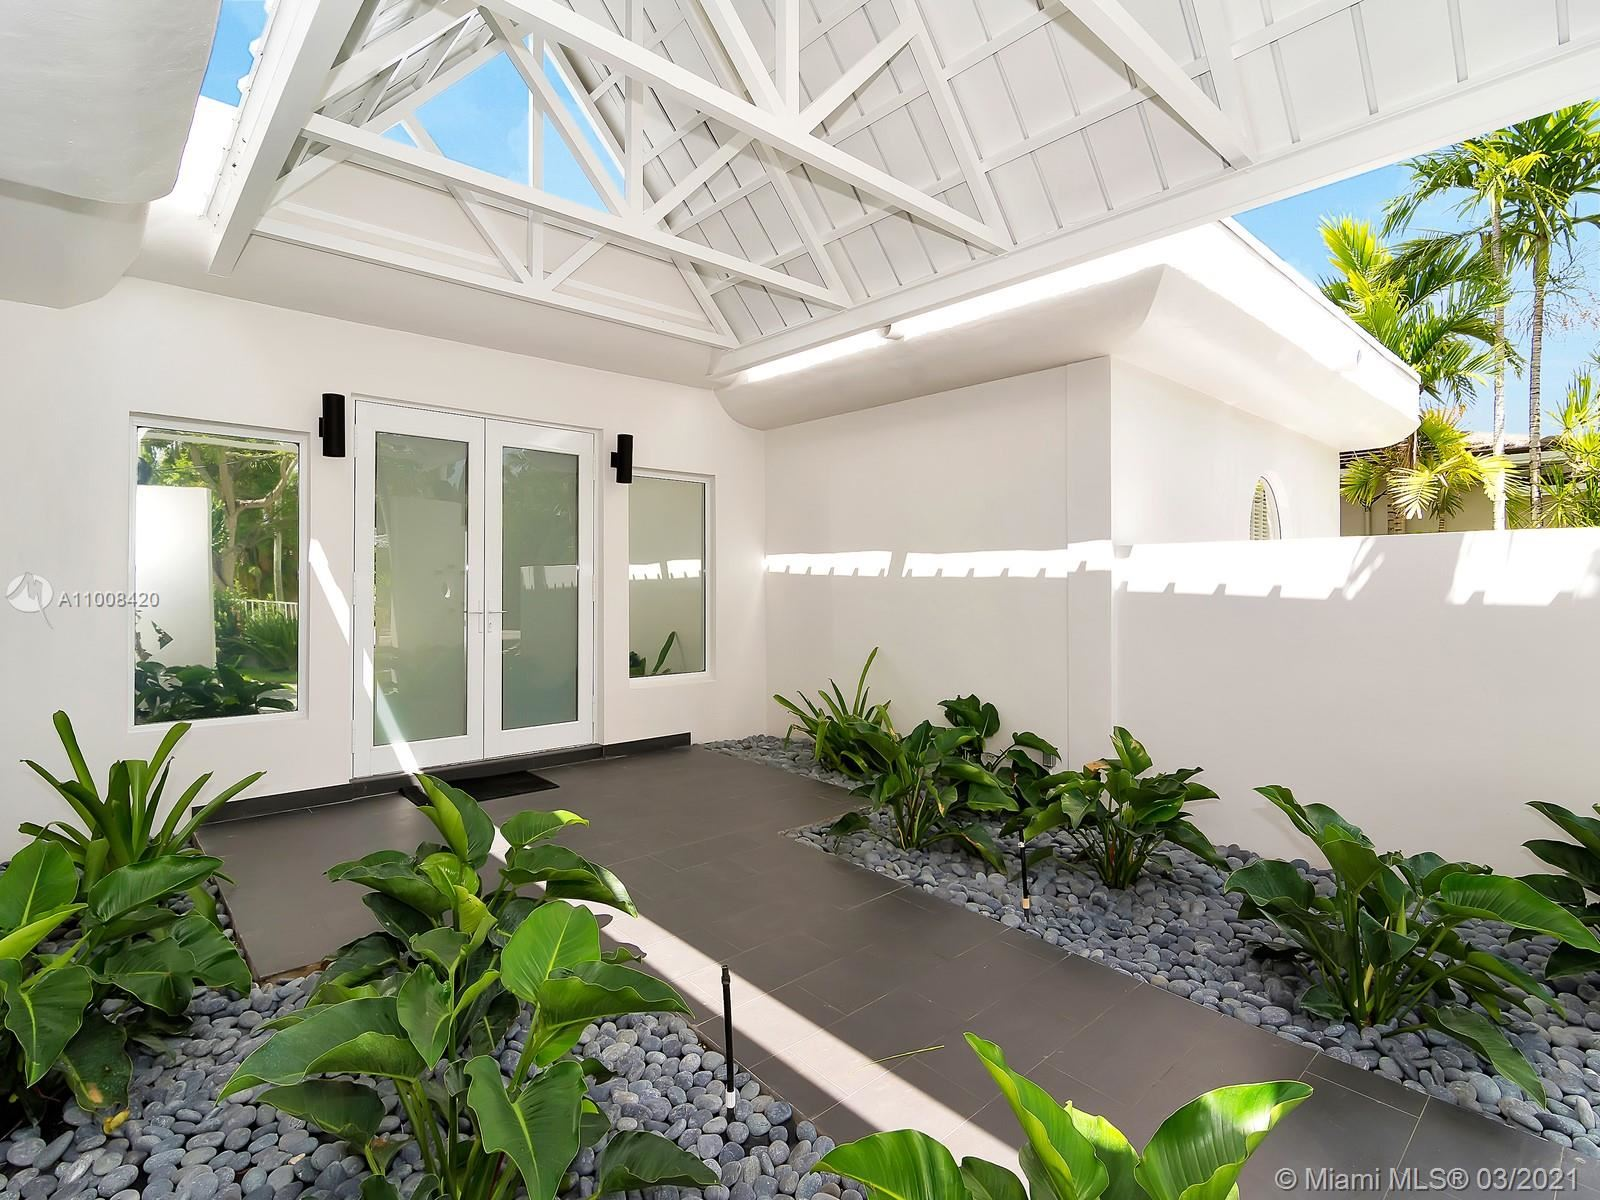 1765 Daytonia Rd, Miami Beach, FL 33141 - #: A11008420